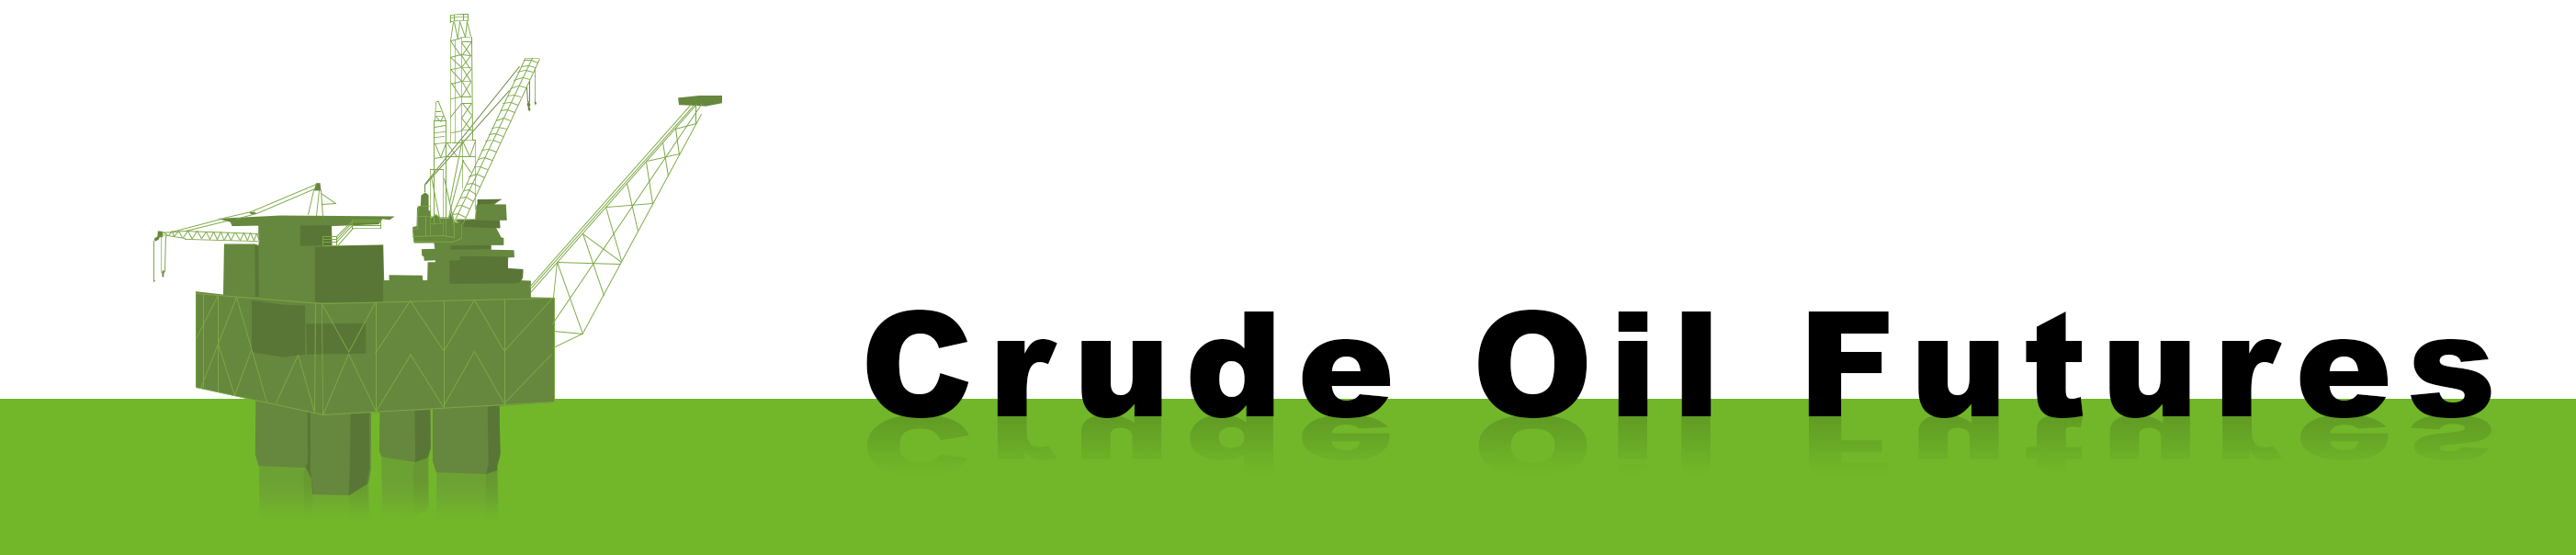 Intro to Trading Crude Oil Futures - IRONBEAM